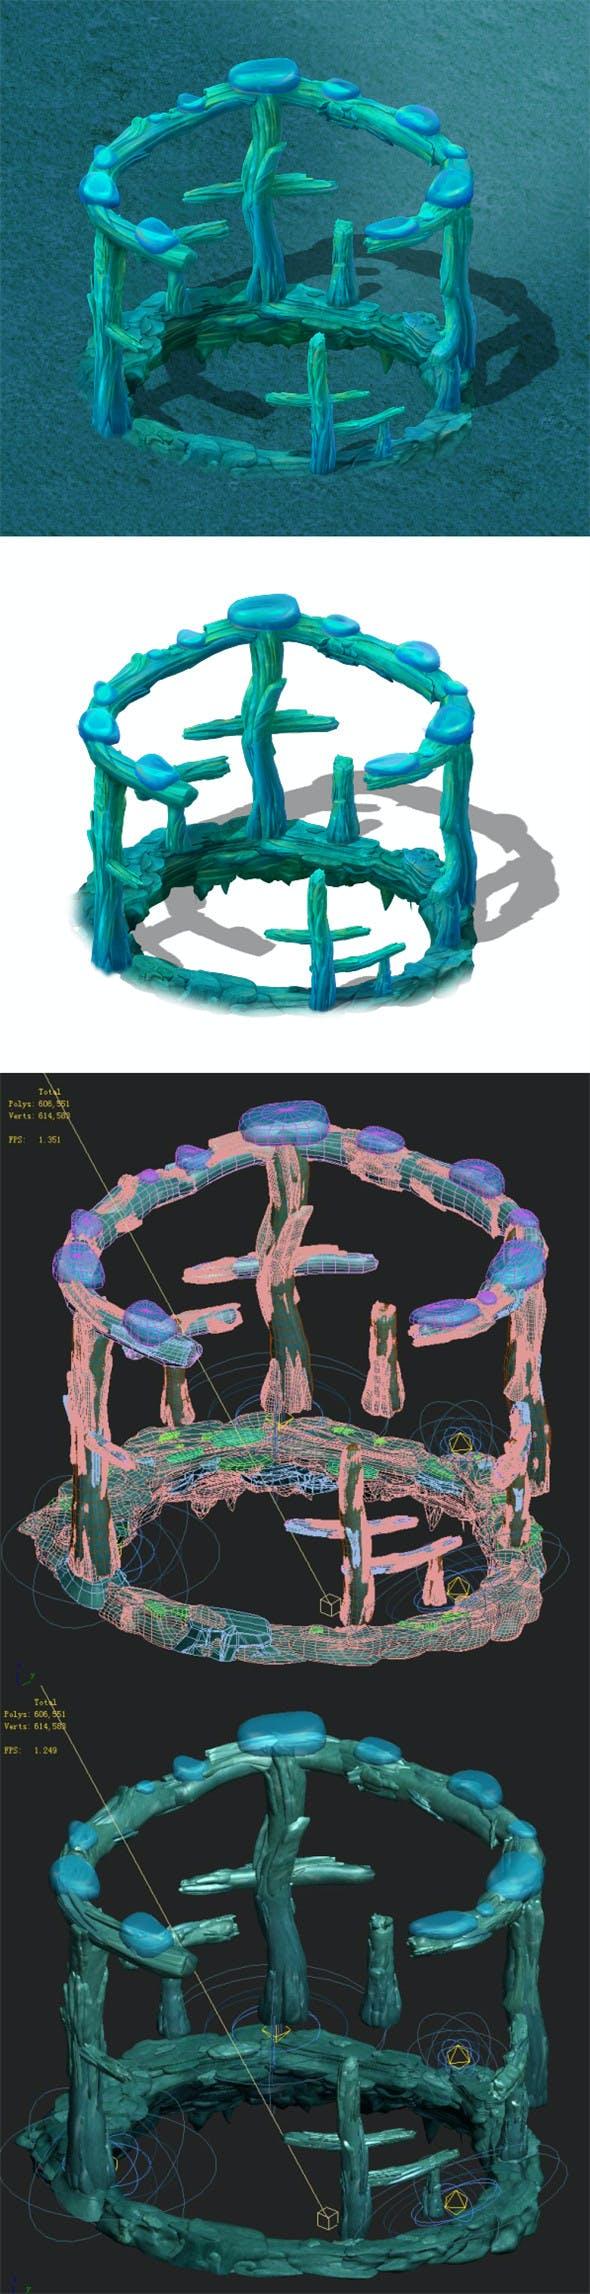 Submarine cartoon world - subsea ladder garden spare parts - 3DOcean Item for Sale